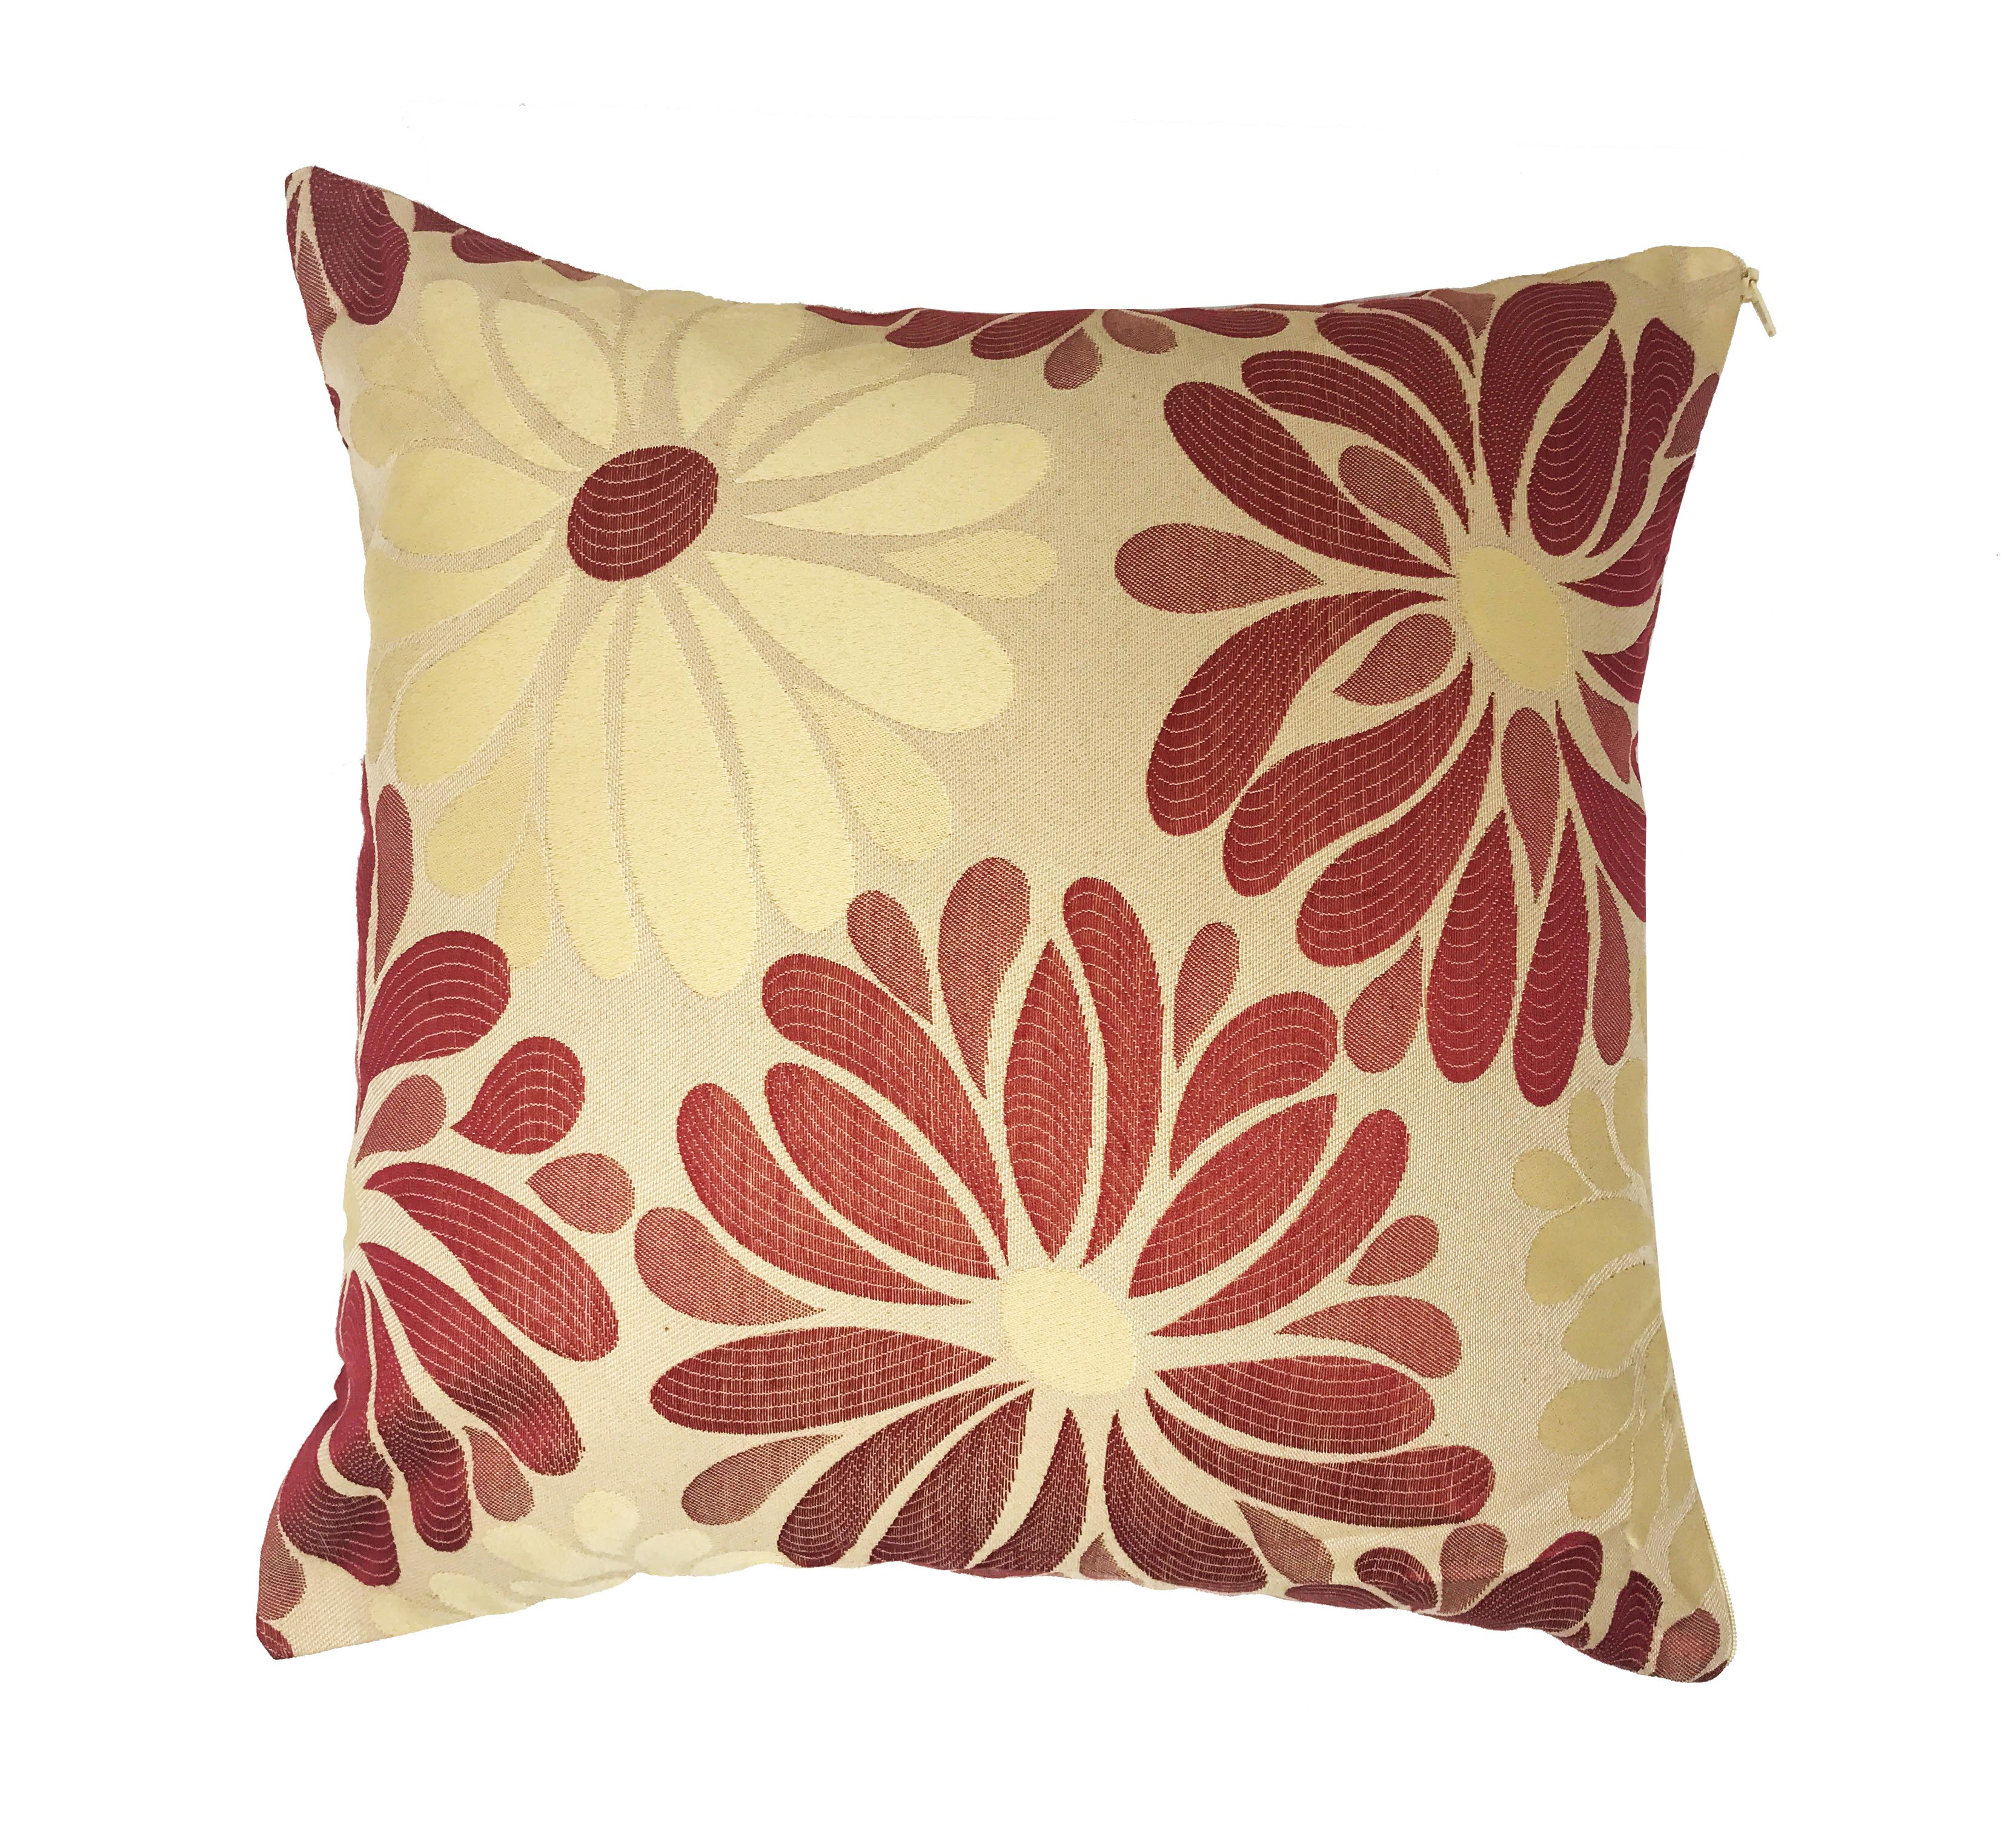 Mariella Brick Red Cream Floral 43cm x 43cm Cushion Cover Only